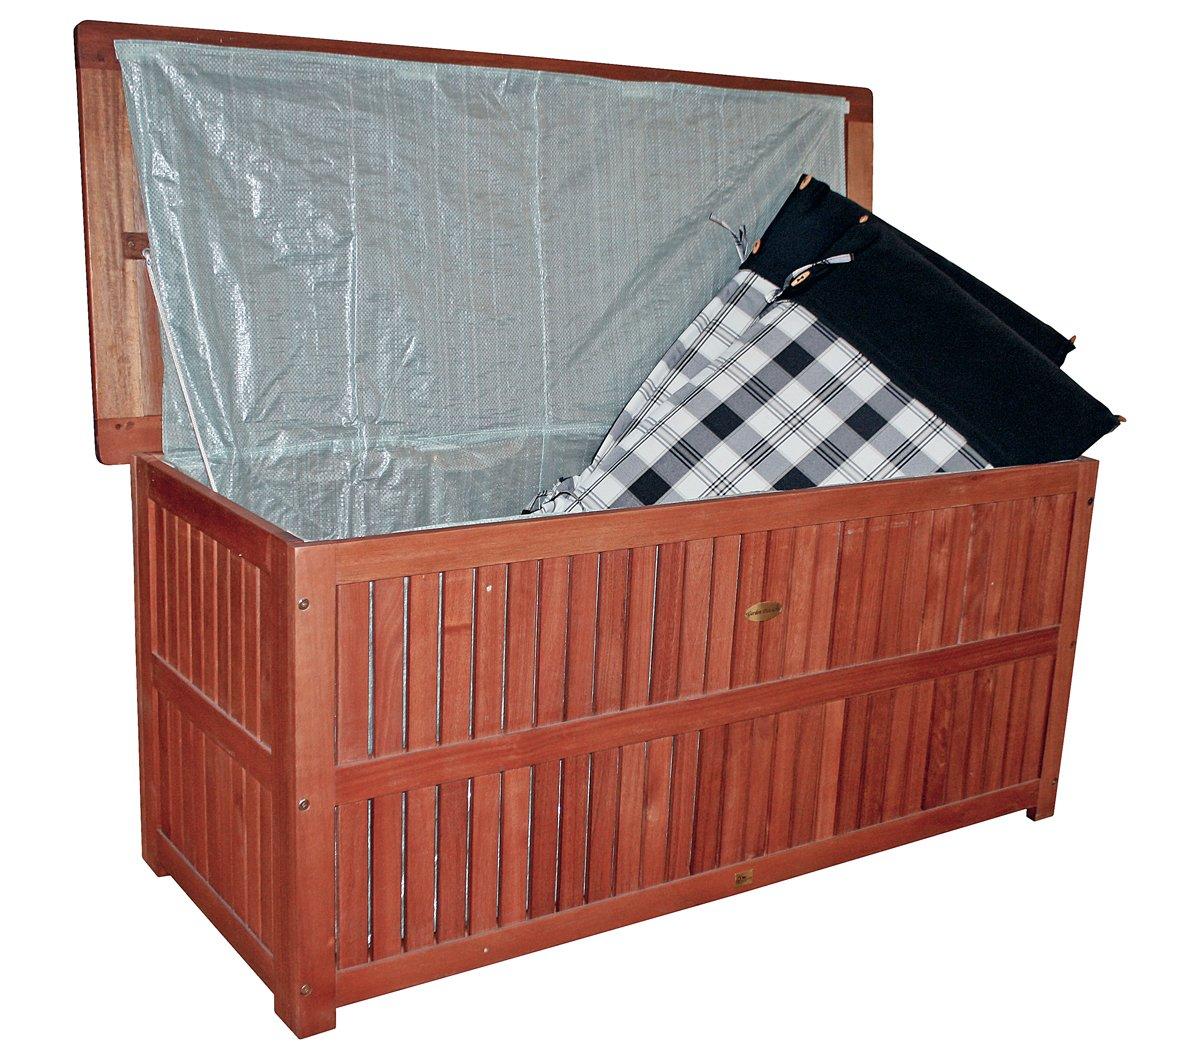 Auflagenbox mit Folieninnentasche aus geöltem Eukalyptus Auflagentruhe Kissenbox Gartenbox Gartentruhe